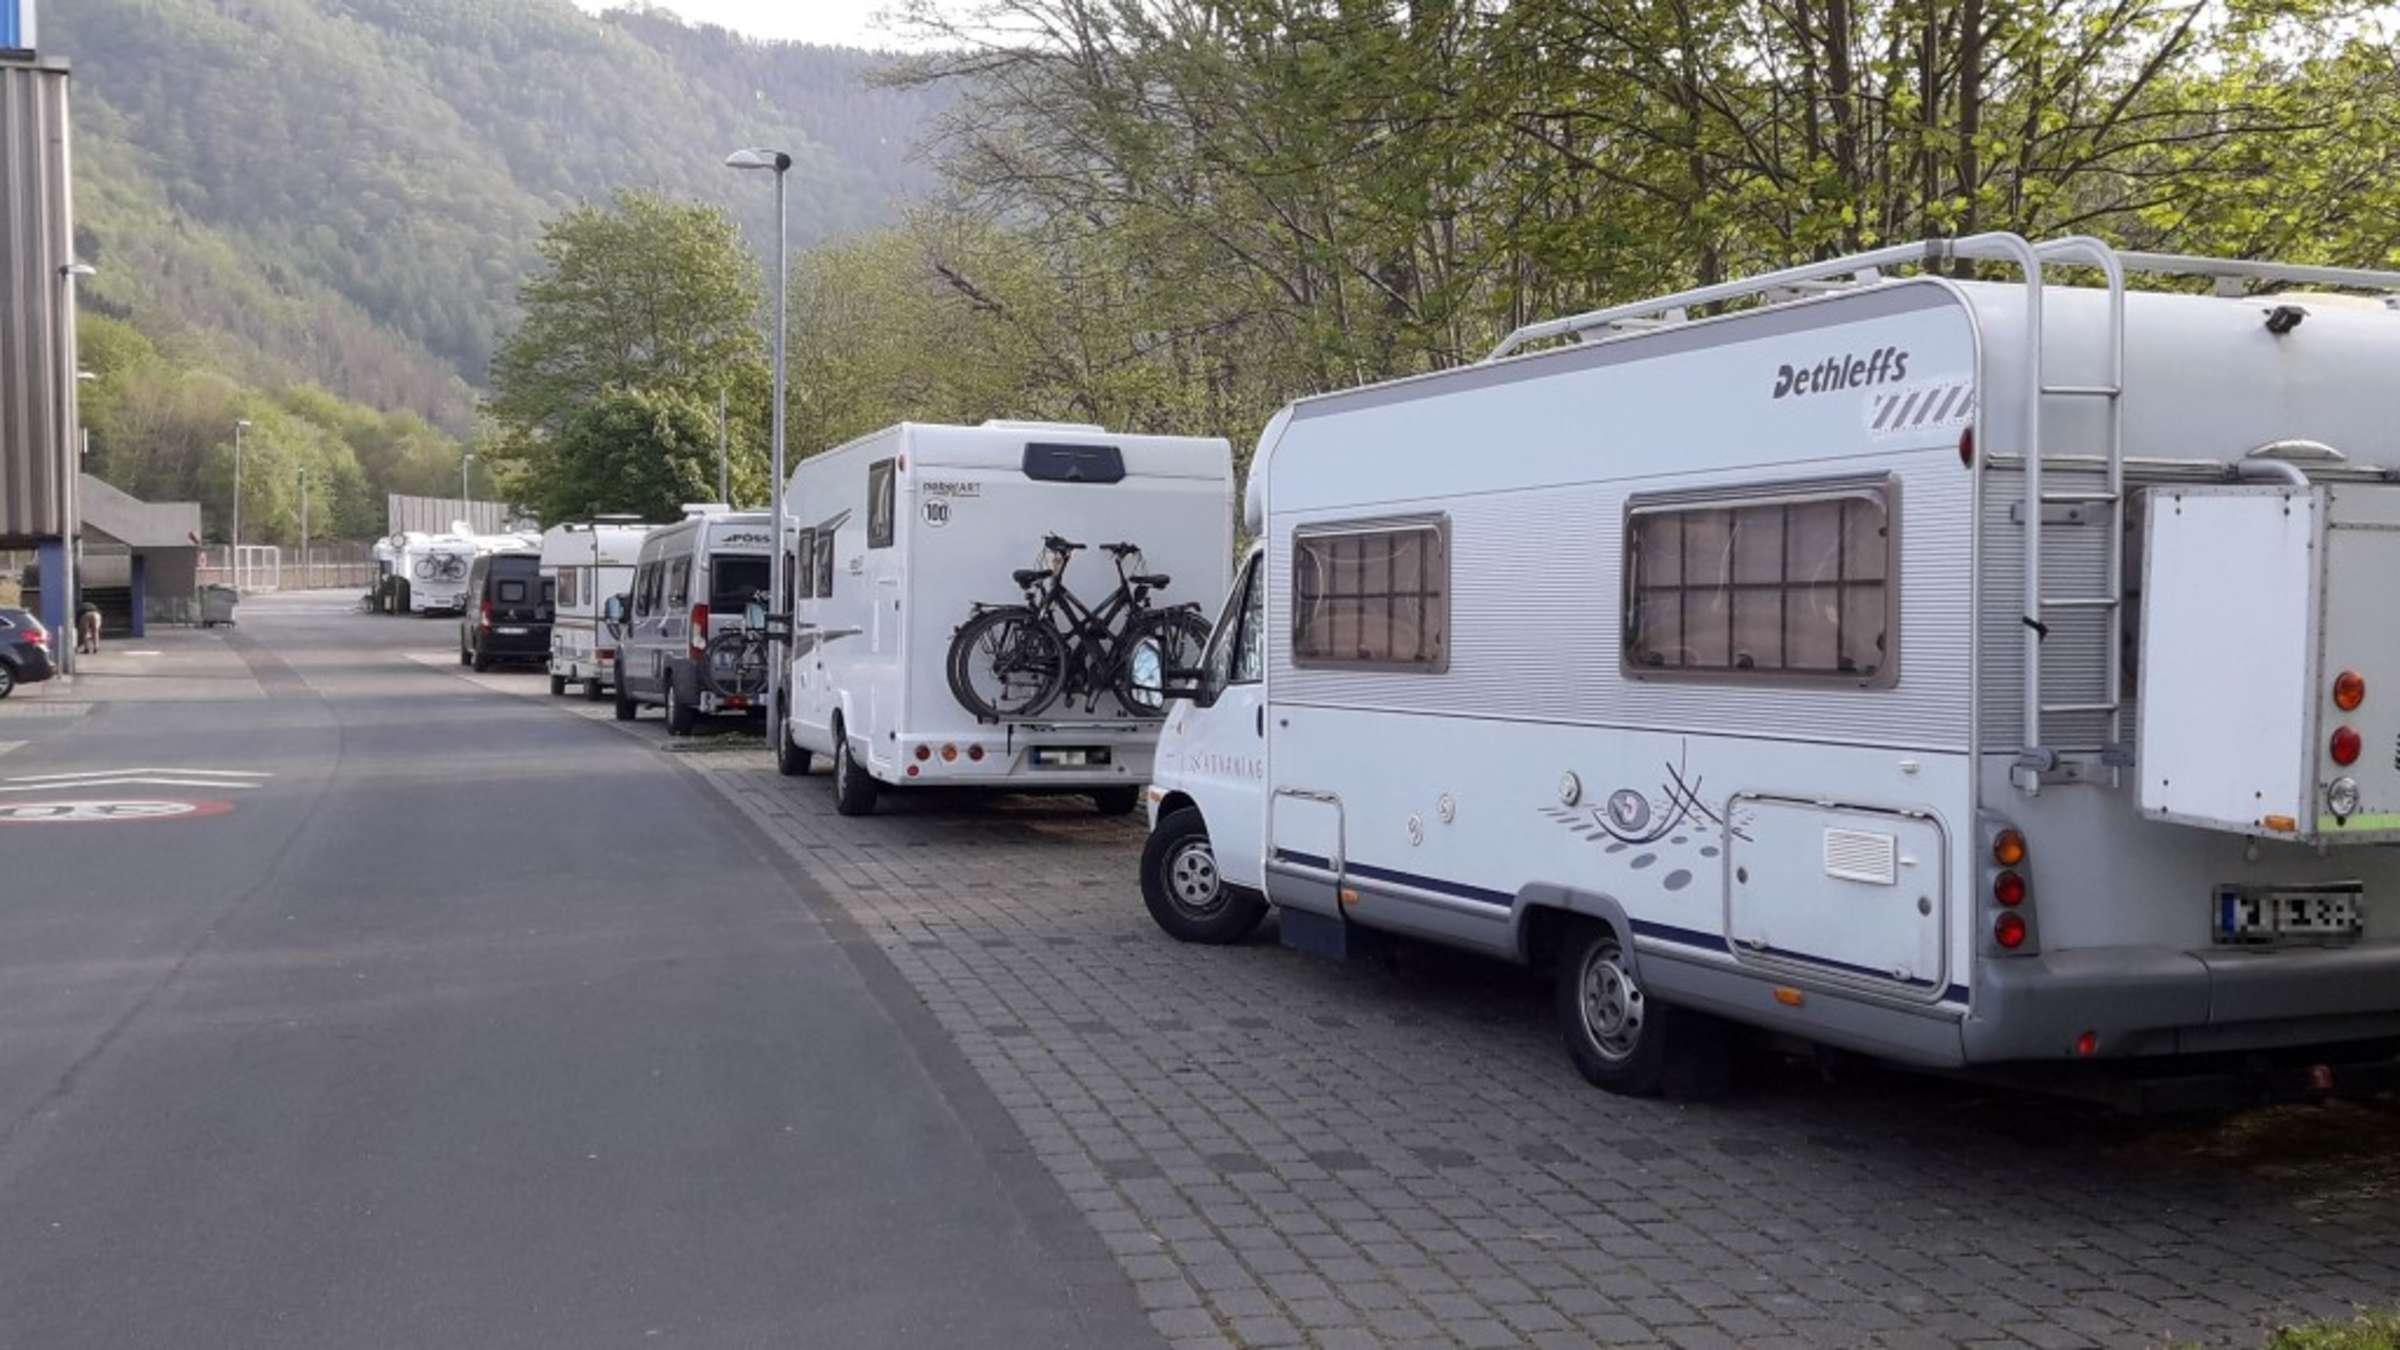 Coronavirus in Altena: Campingplatz offen, Camper stürmen Platz an